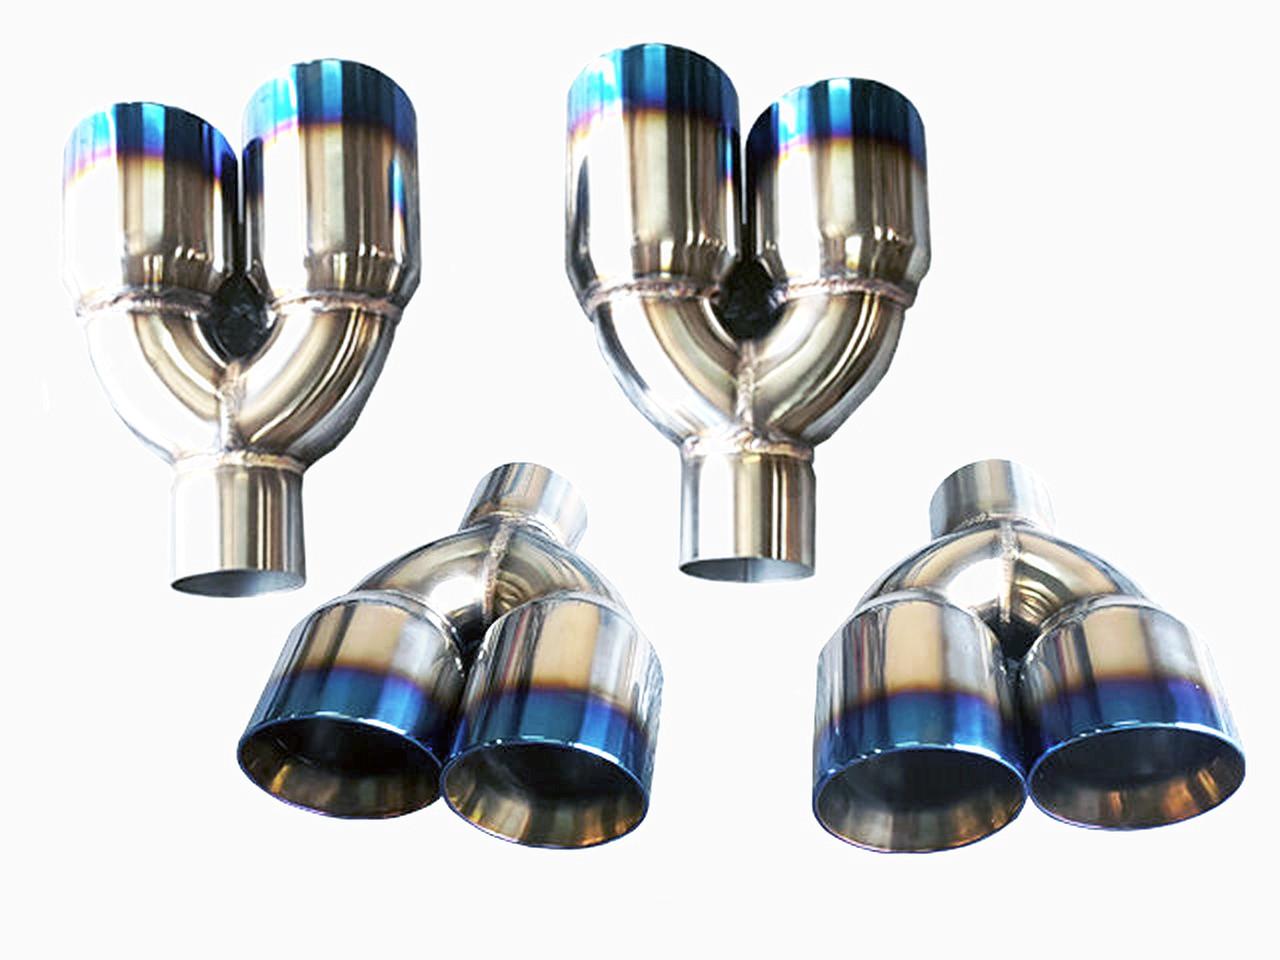 tsudo quad universal 3 5 staggered titanium burnt exhaust tips